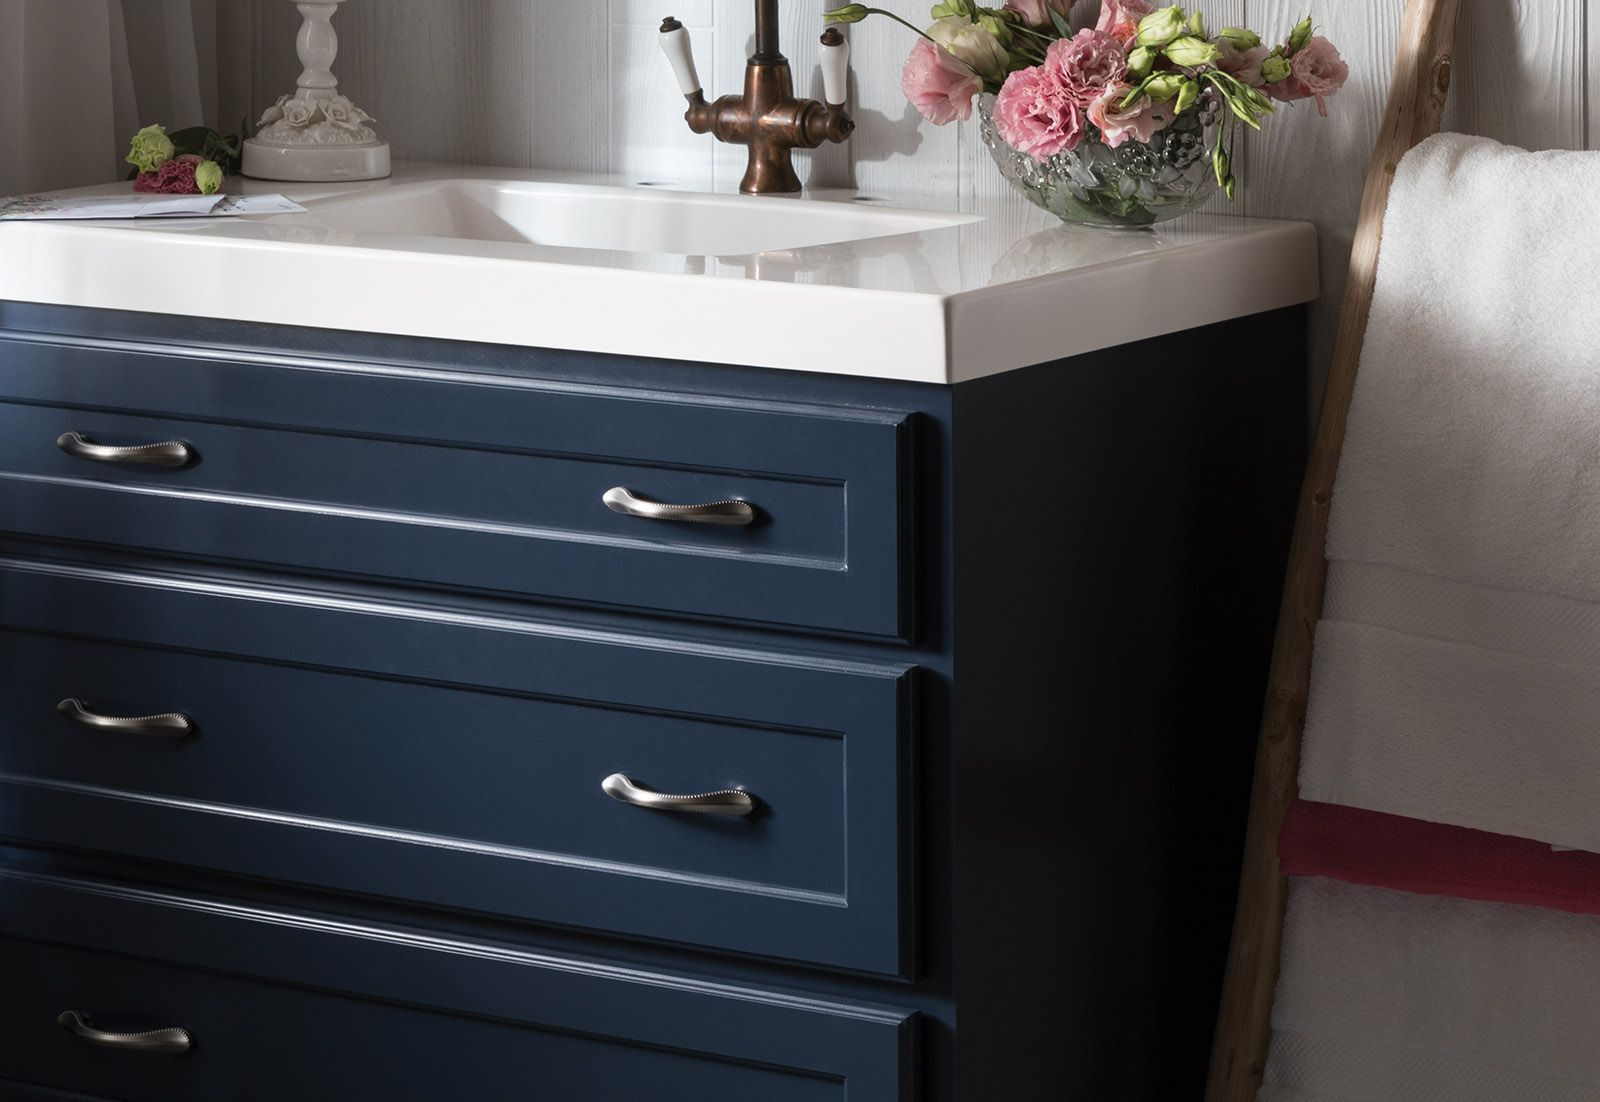 Modern Vanity Tops For Your Bathroom Remodel Bertch Cabinet Manfacturing Bathrooms Remodel Shower Renovation Bathroom Remodeling Contractors